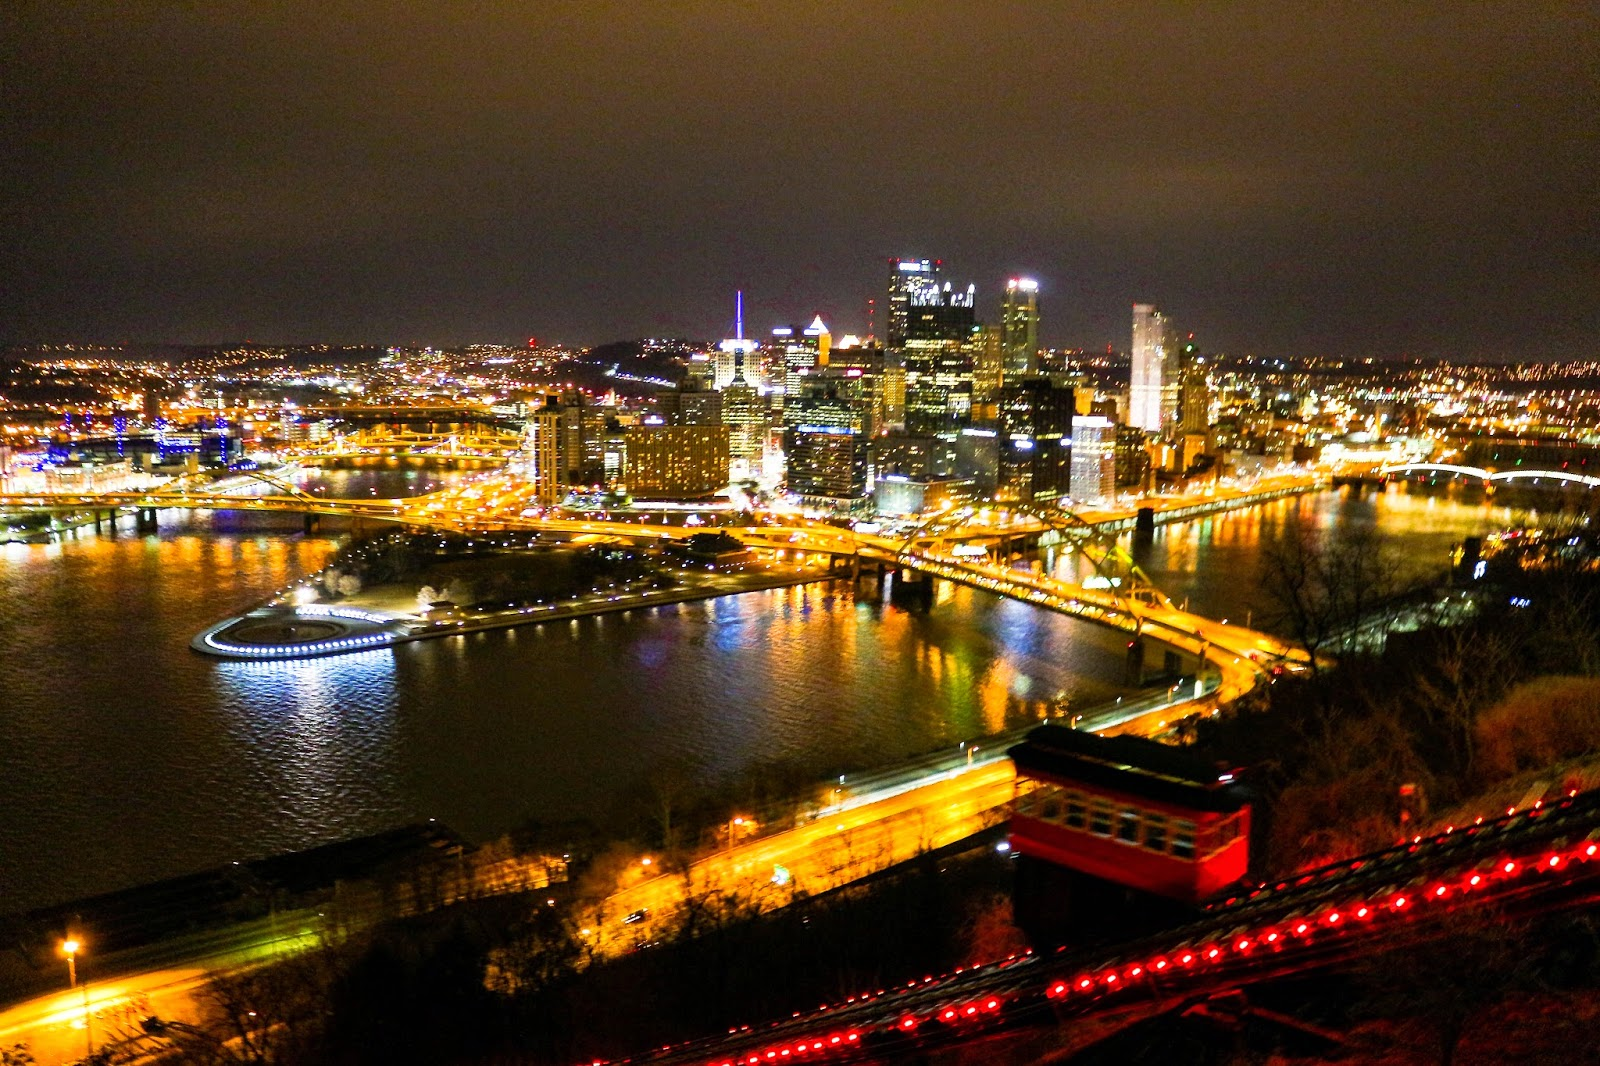 Tom Ratchkauskas Photography: Pittsburgh-Night